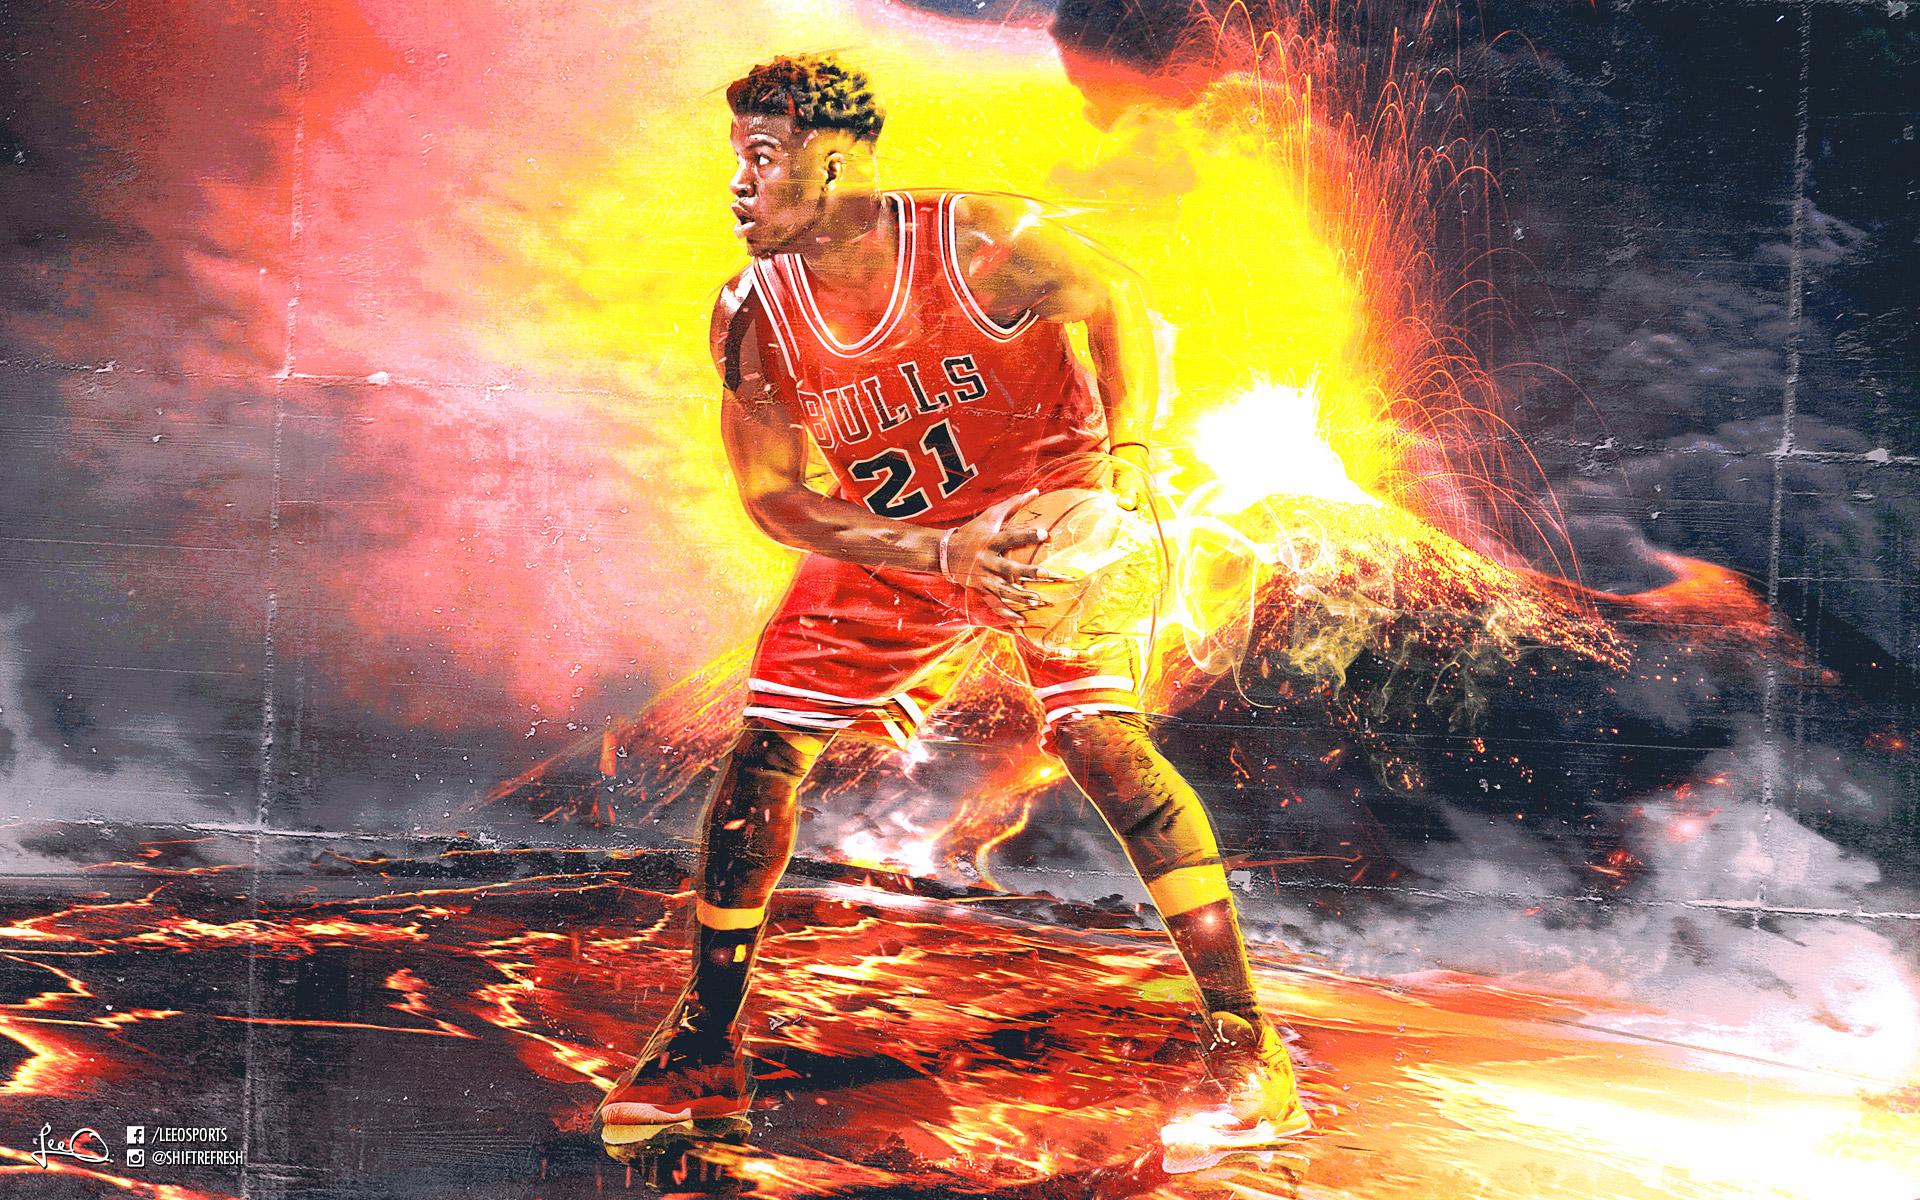 Jimmy Butler Chicago Bulls 2016 Wallpaper Basketball Wallpapers at 1920x1200